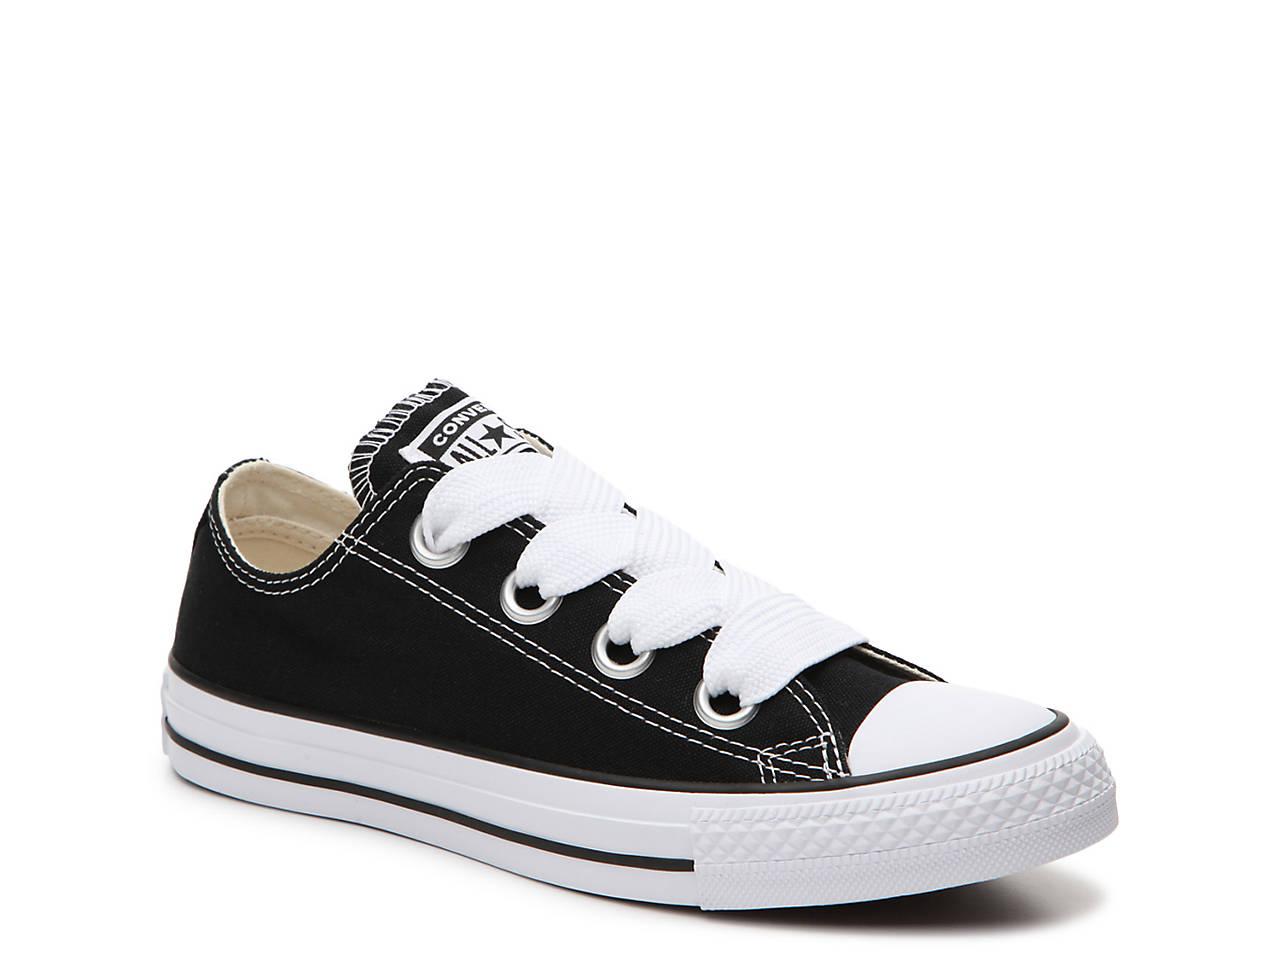 6ce724555867 Converse Chuck Taylor All Star Big Eyelets Sneaker - Women s Women s ...